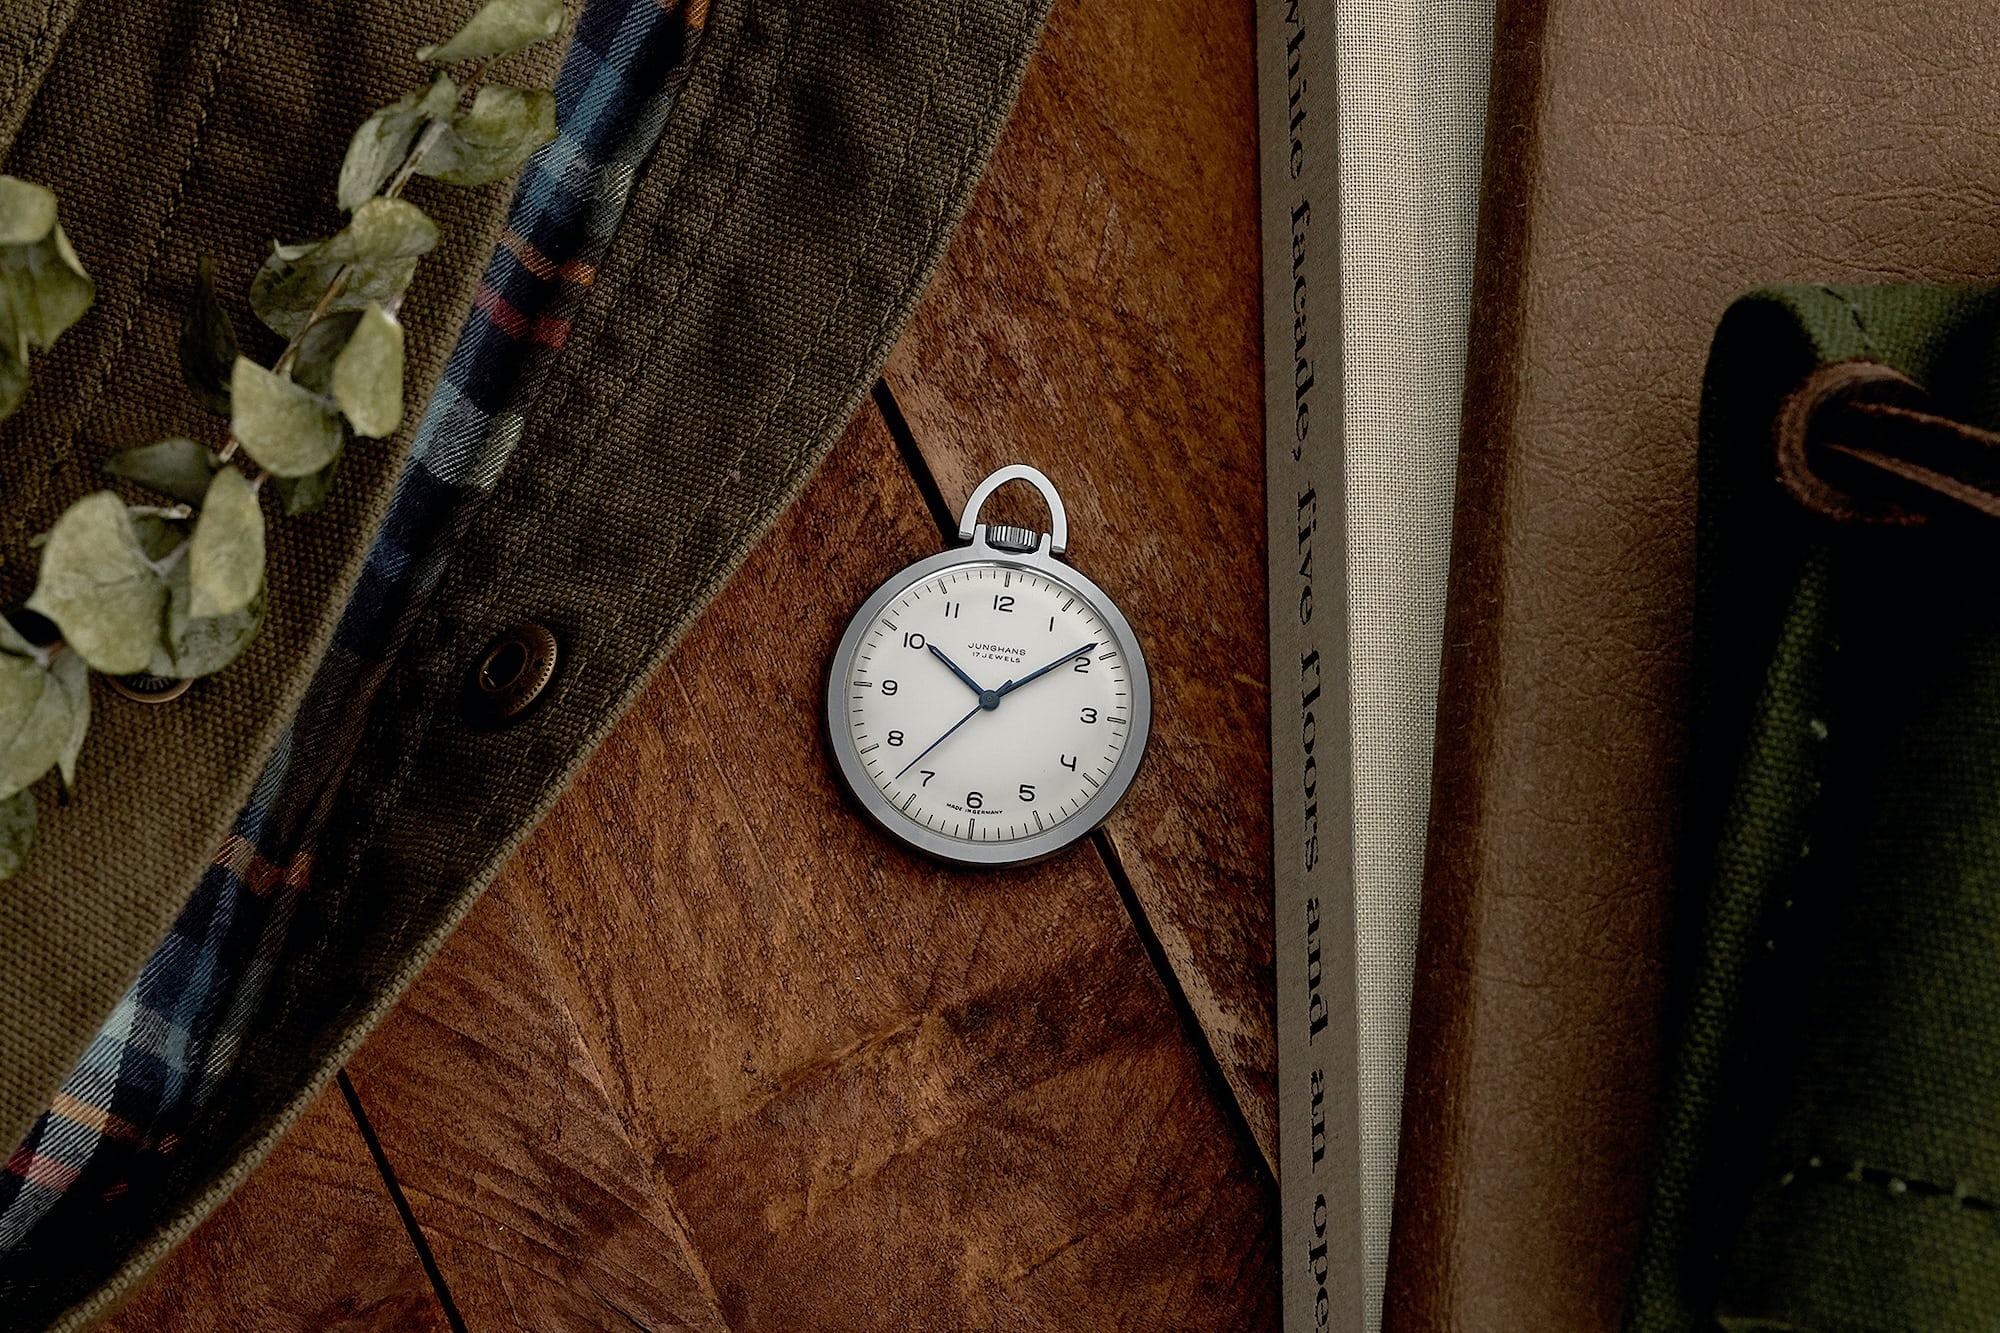 "<p><a href=""https://shop.hodinkee.com/products/2496-junghans-pocket-watch"" rel=""noopener"" target=""_blank""><u>1960s Junghans Pocket Watch</u></a></p>"